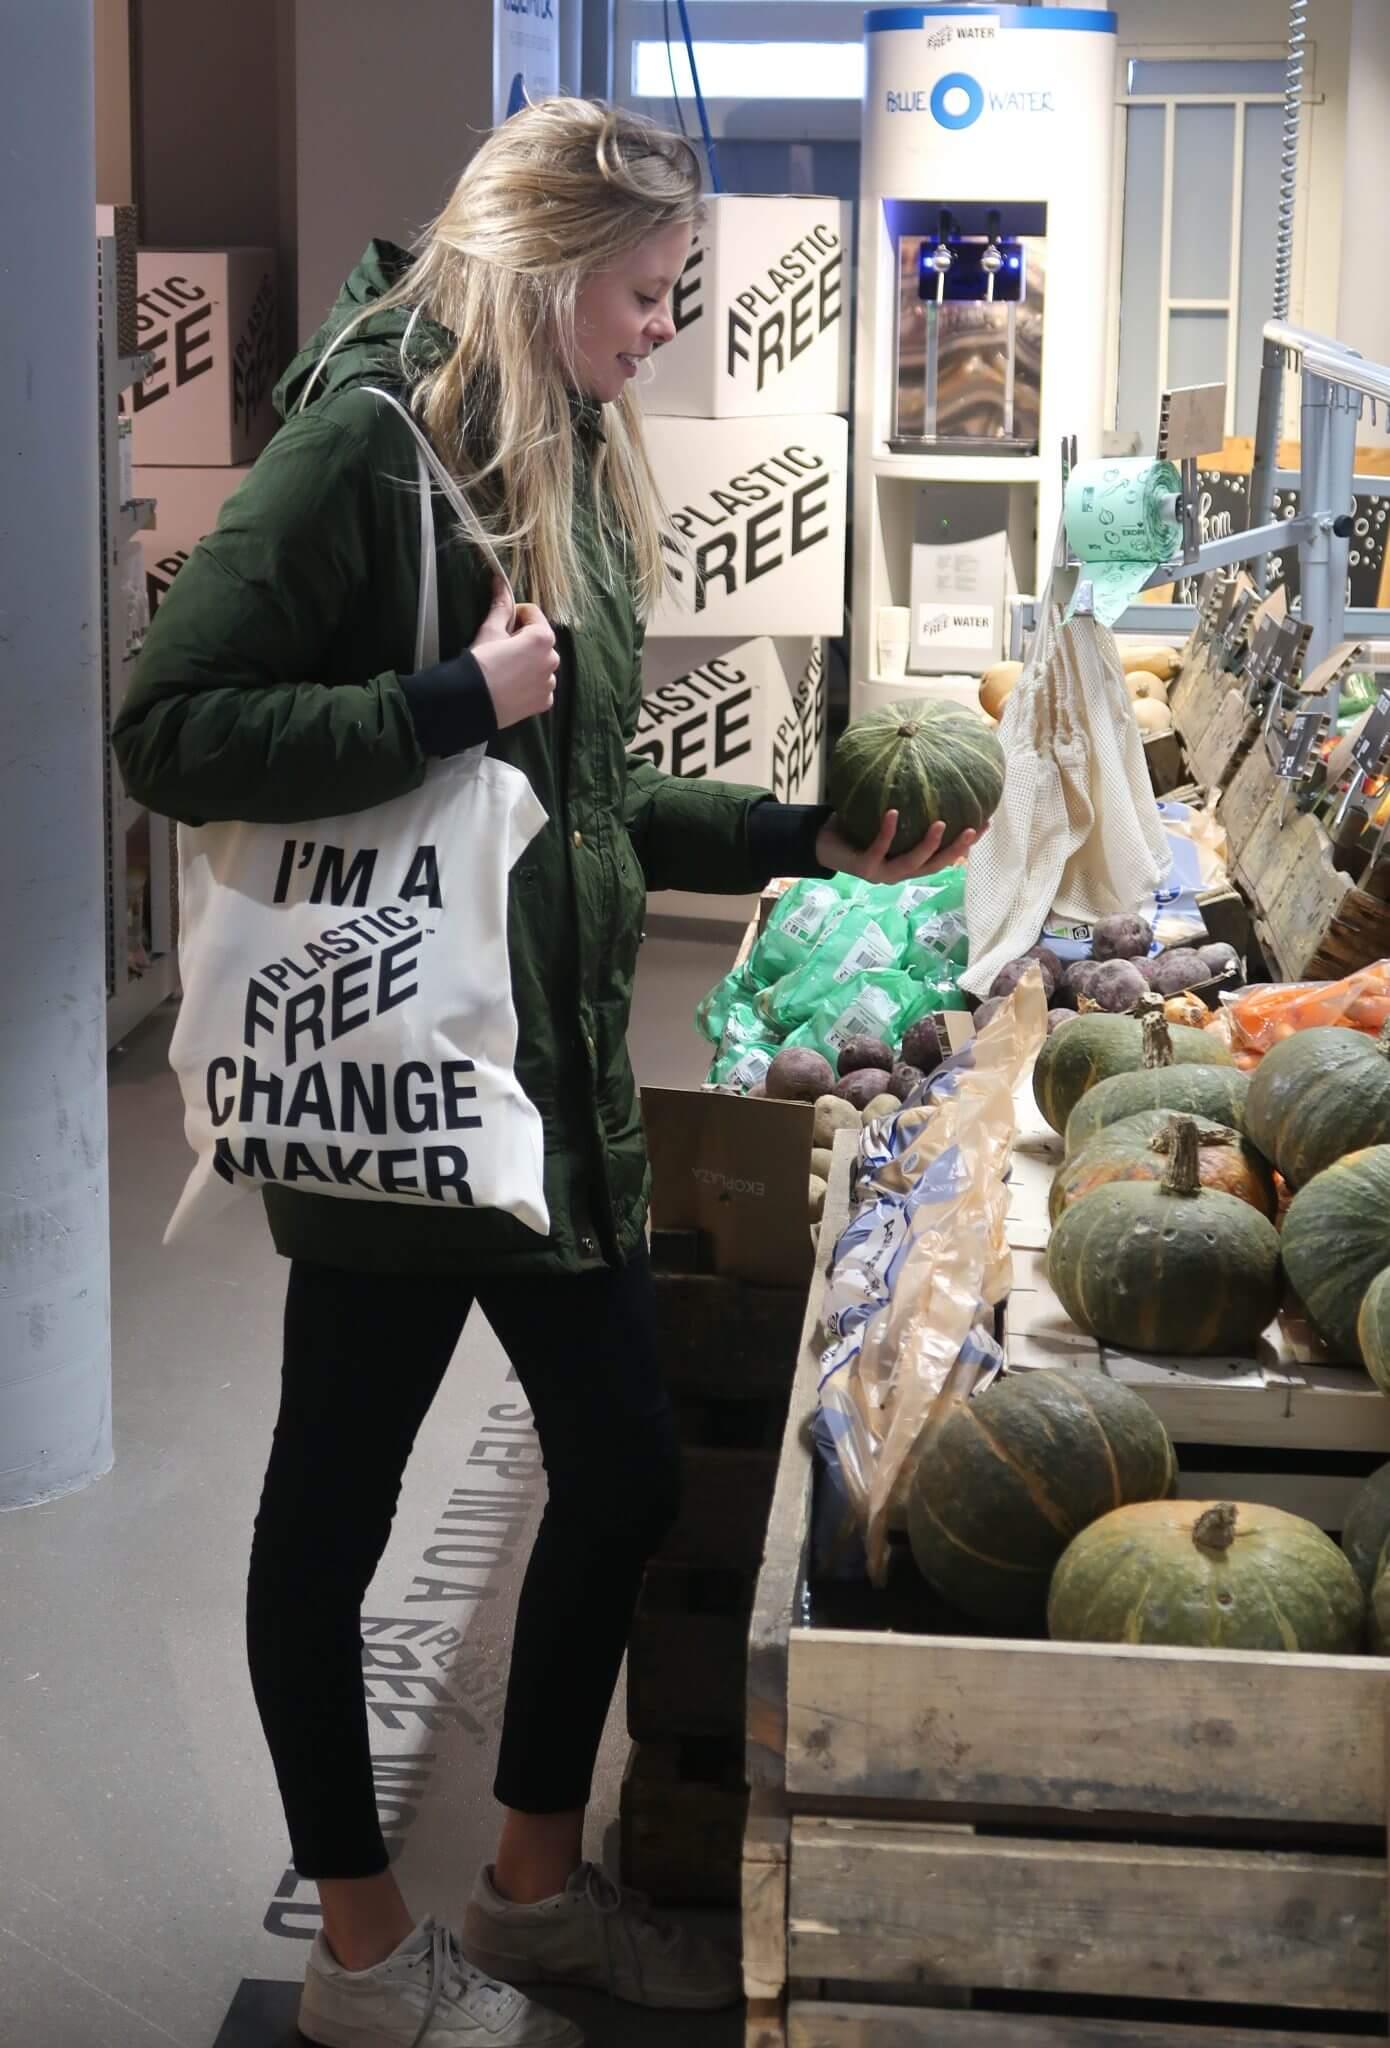 ekoplaza-plasticvrije-supermarkt1 (1 van 1)